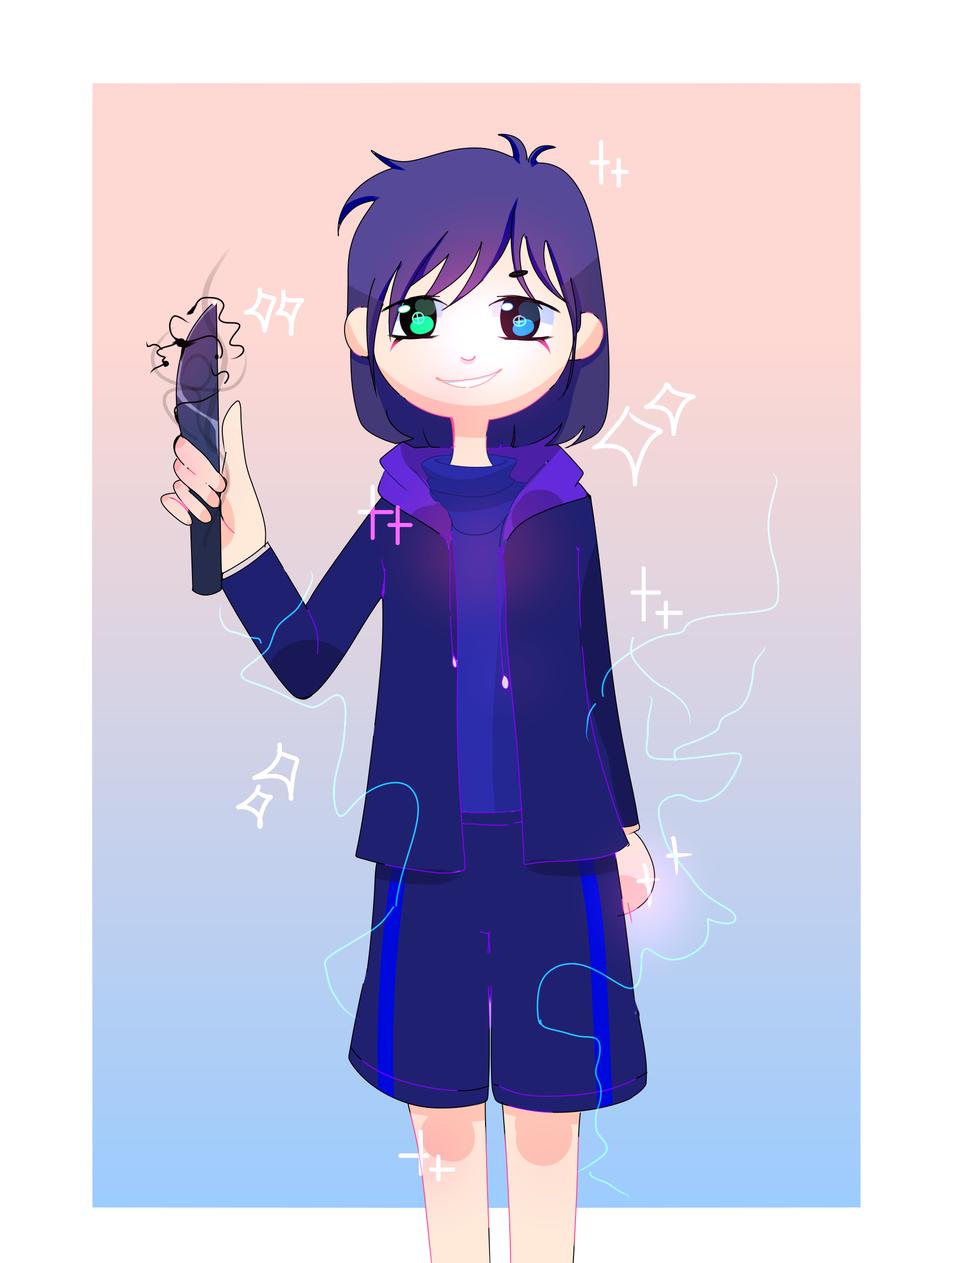 A gift for Danizinha! I hope ya like it ^^ Illust of Infinite stylez medibangpaint blue infinitestylez knife cute Danizinhaundertale electric